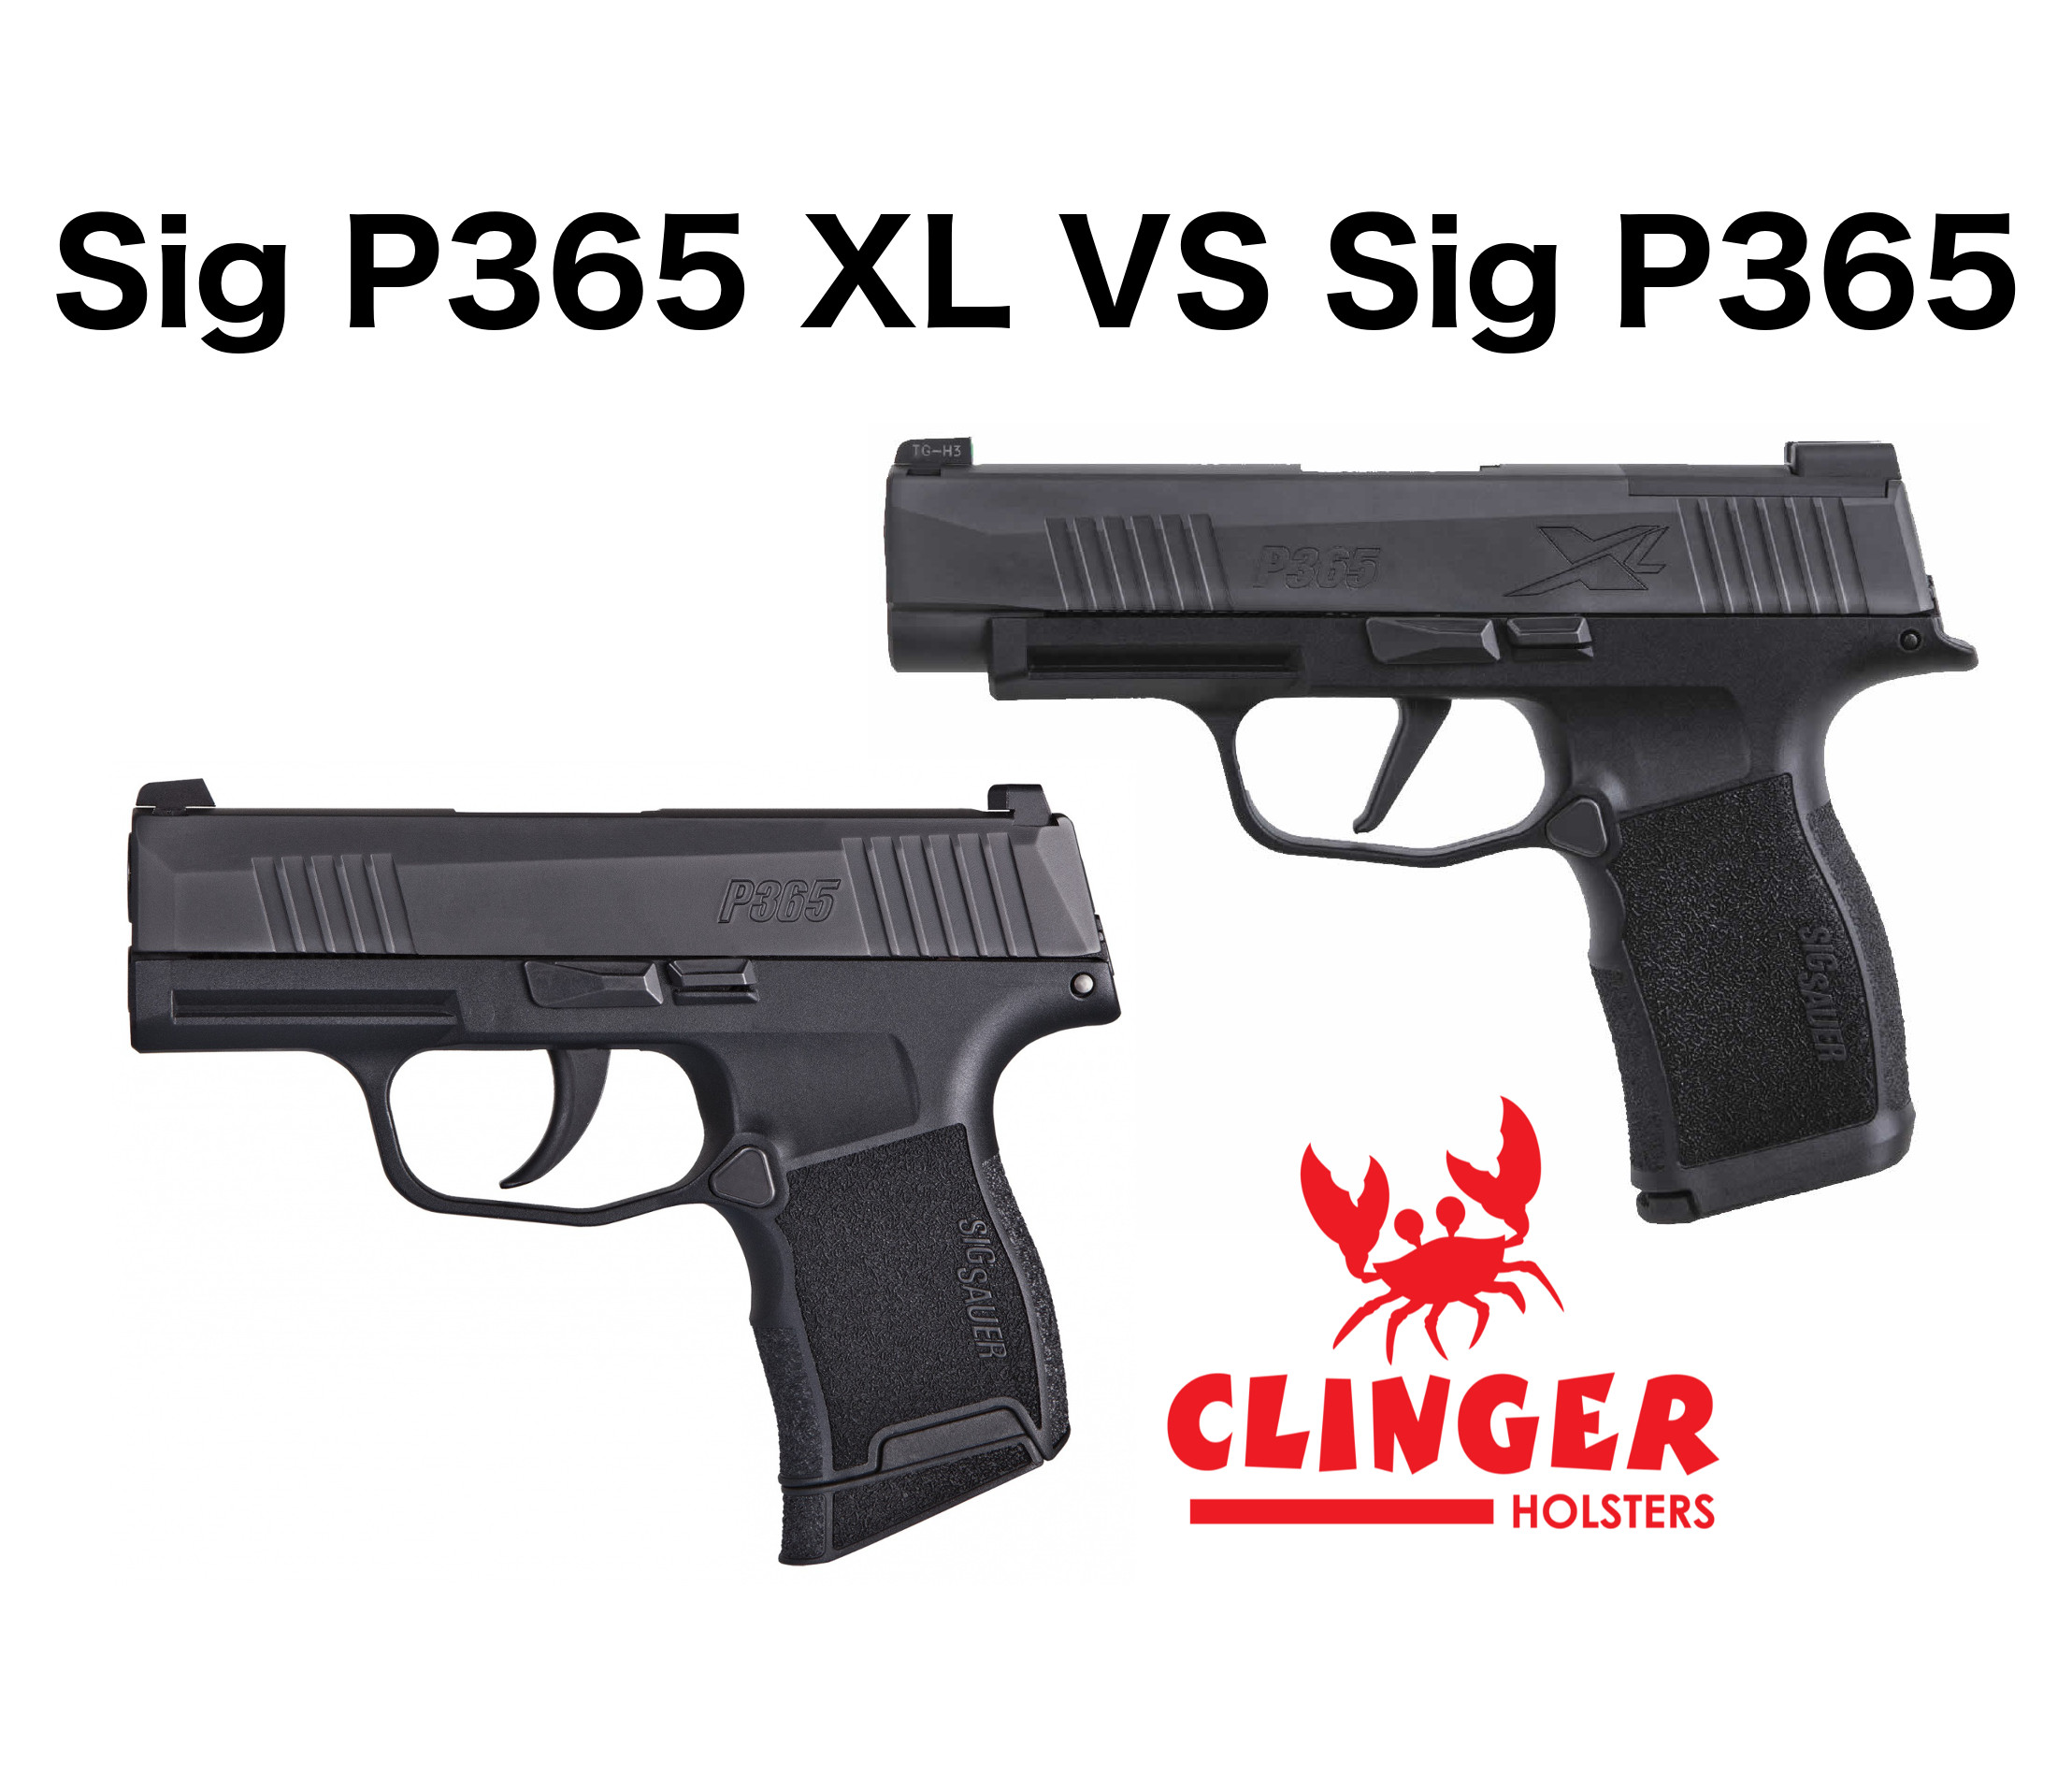 Sig P365 XL VS Sig P365